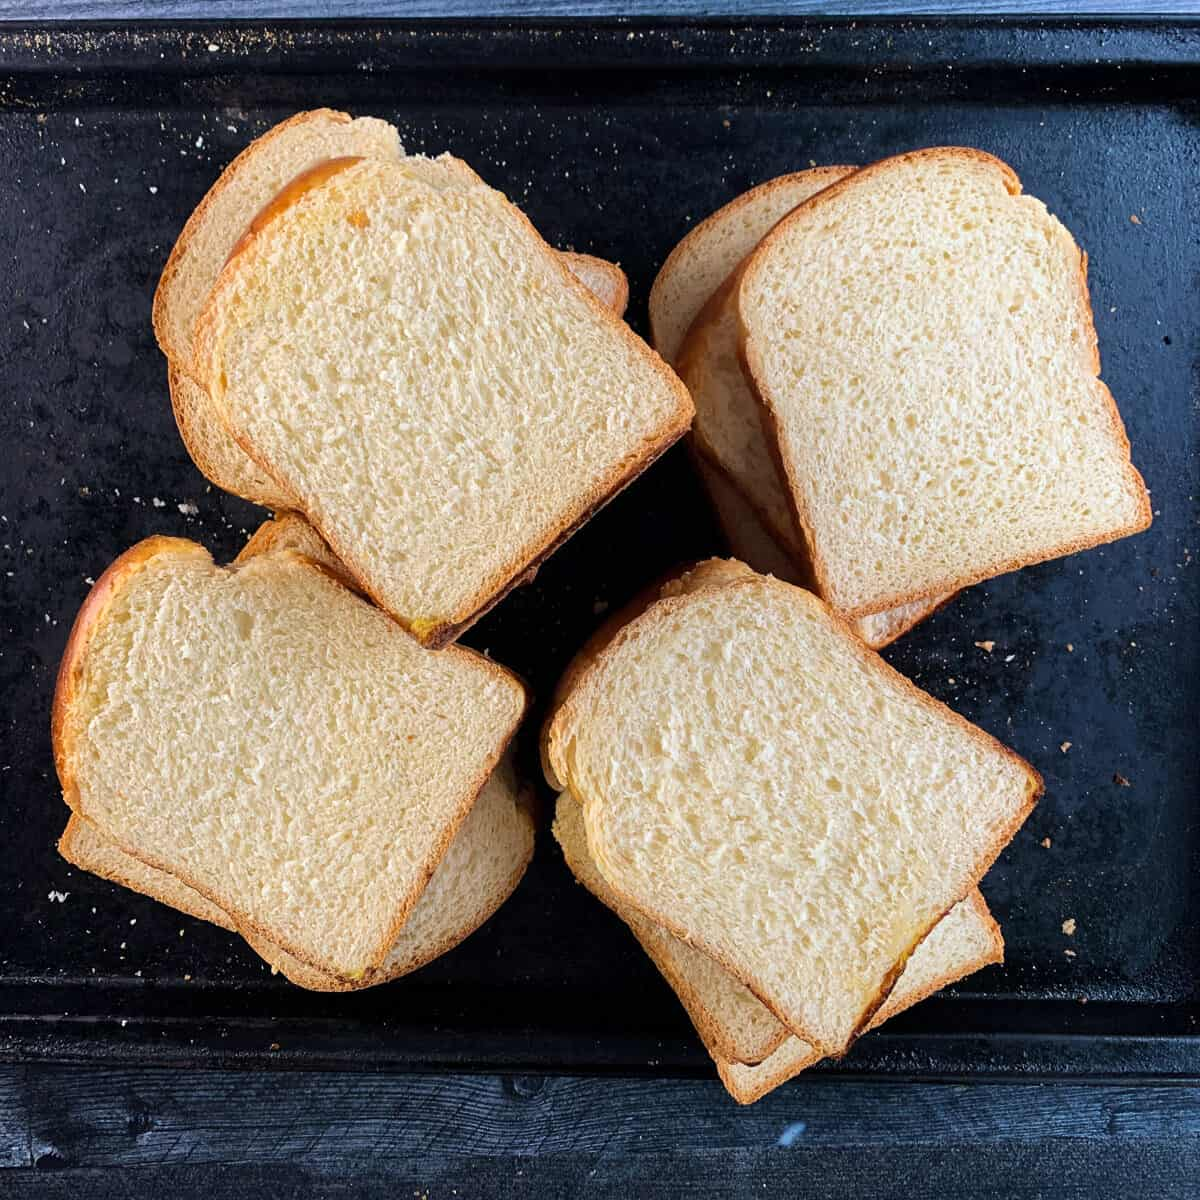 slices of shokupan (sandwich bread) on black baking tray